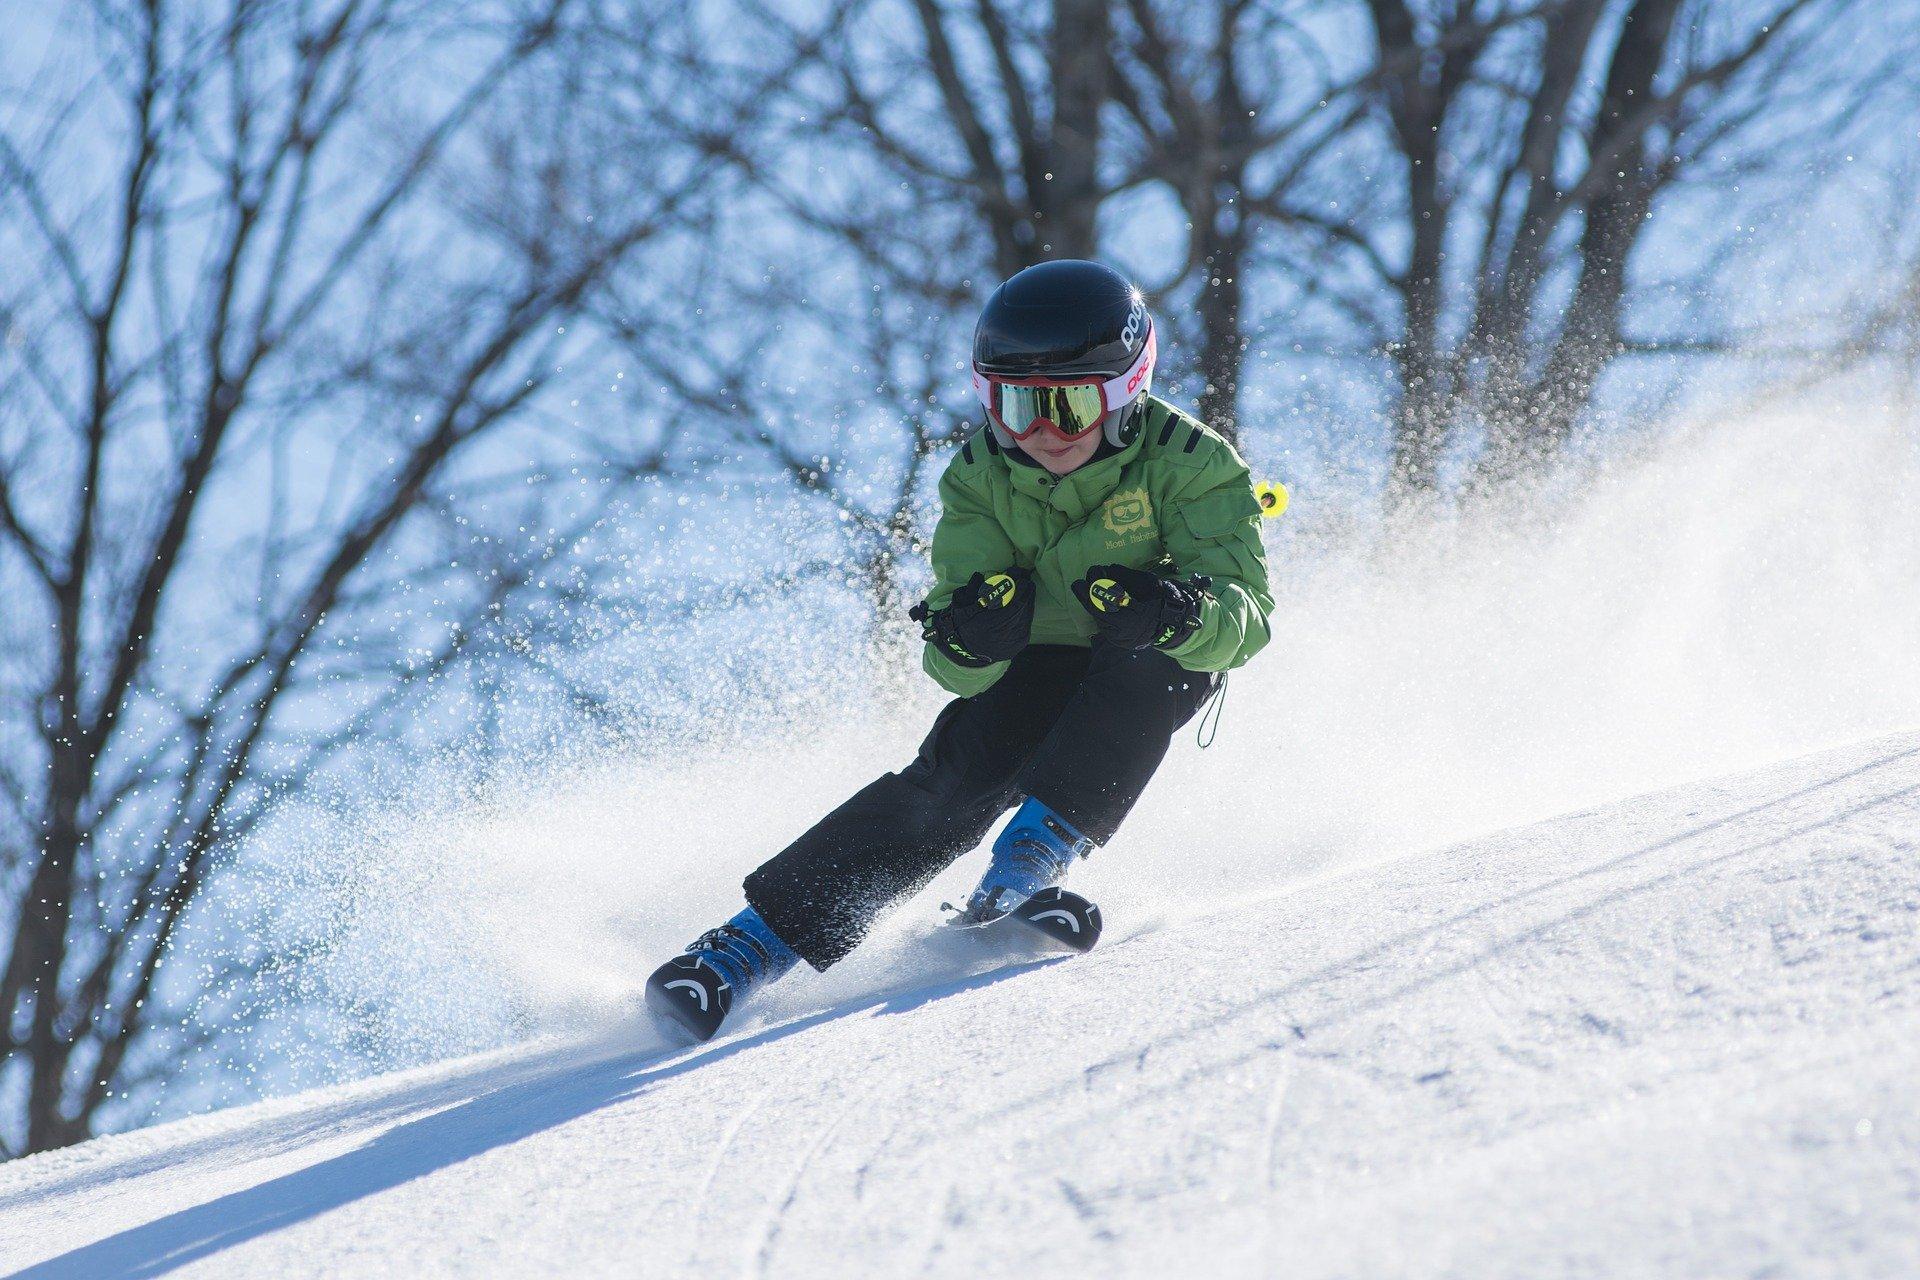 skiing winter sports pixabay